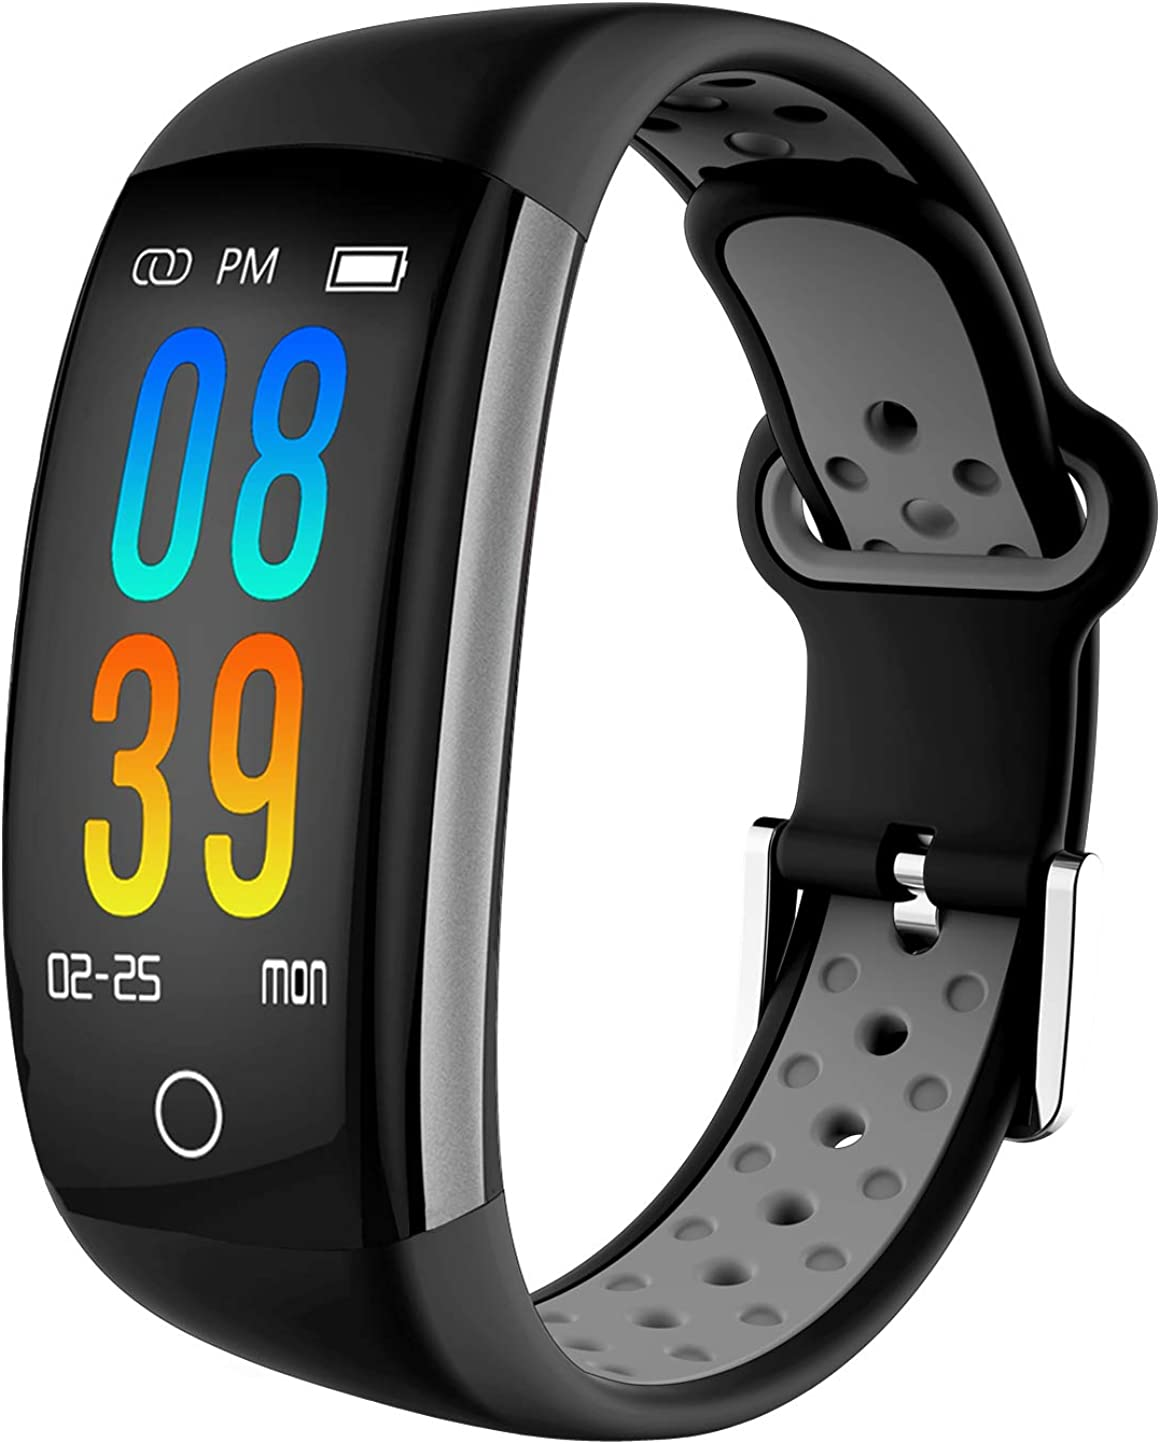 IP68 Fitness Tracker Blood Pressure Heat Rate Monitor Smart Watch Blood Oxygen Sleep Monitor Activity Tracker Pedometer Watch for Women Men